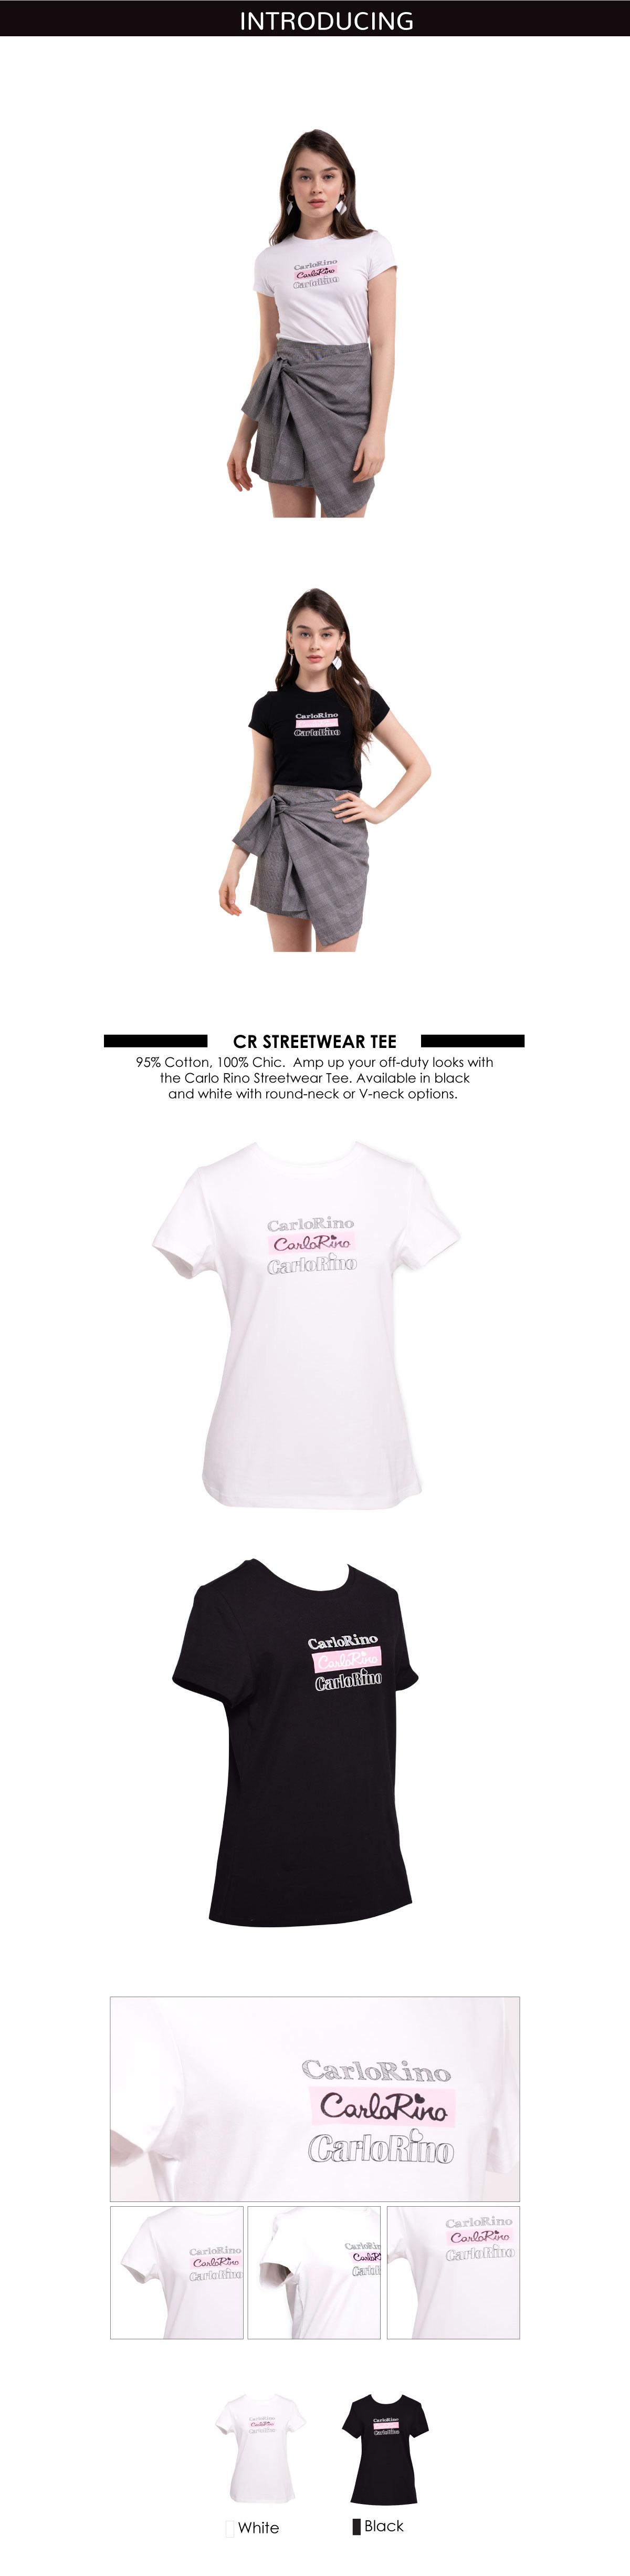 31T001 F002 - Round-neck CR Print Tee